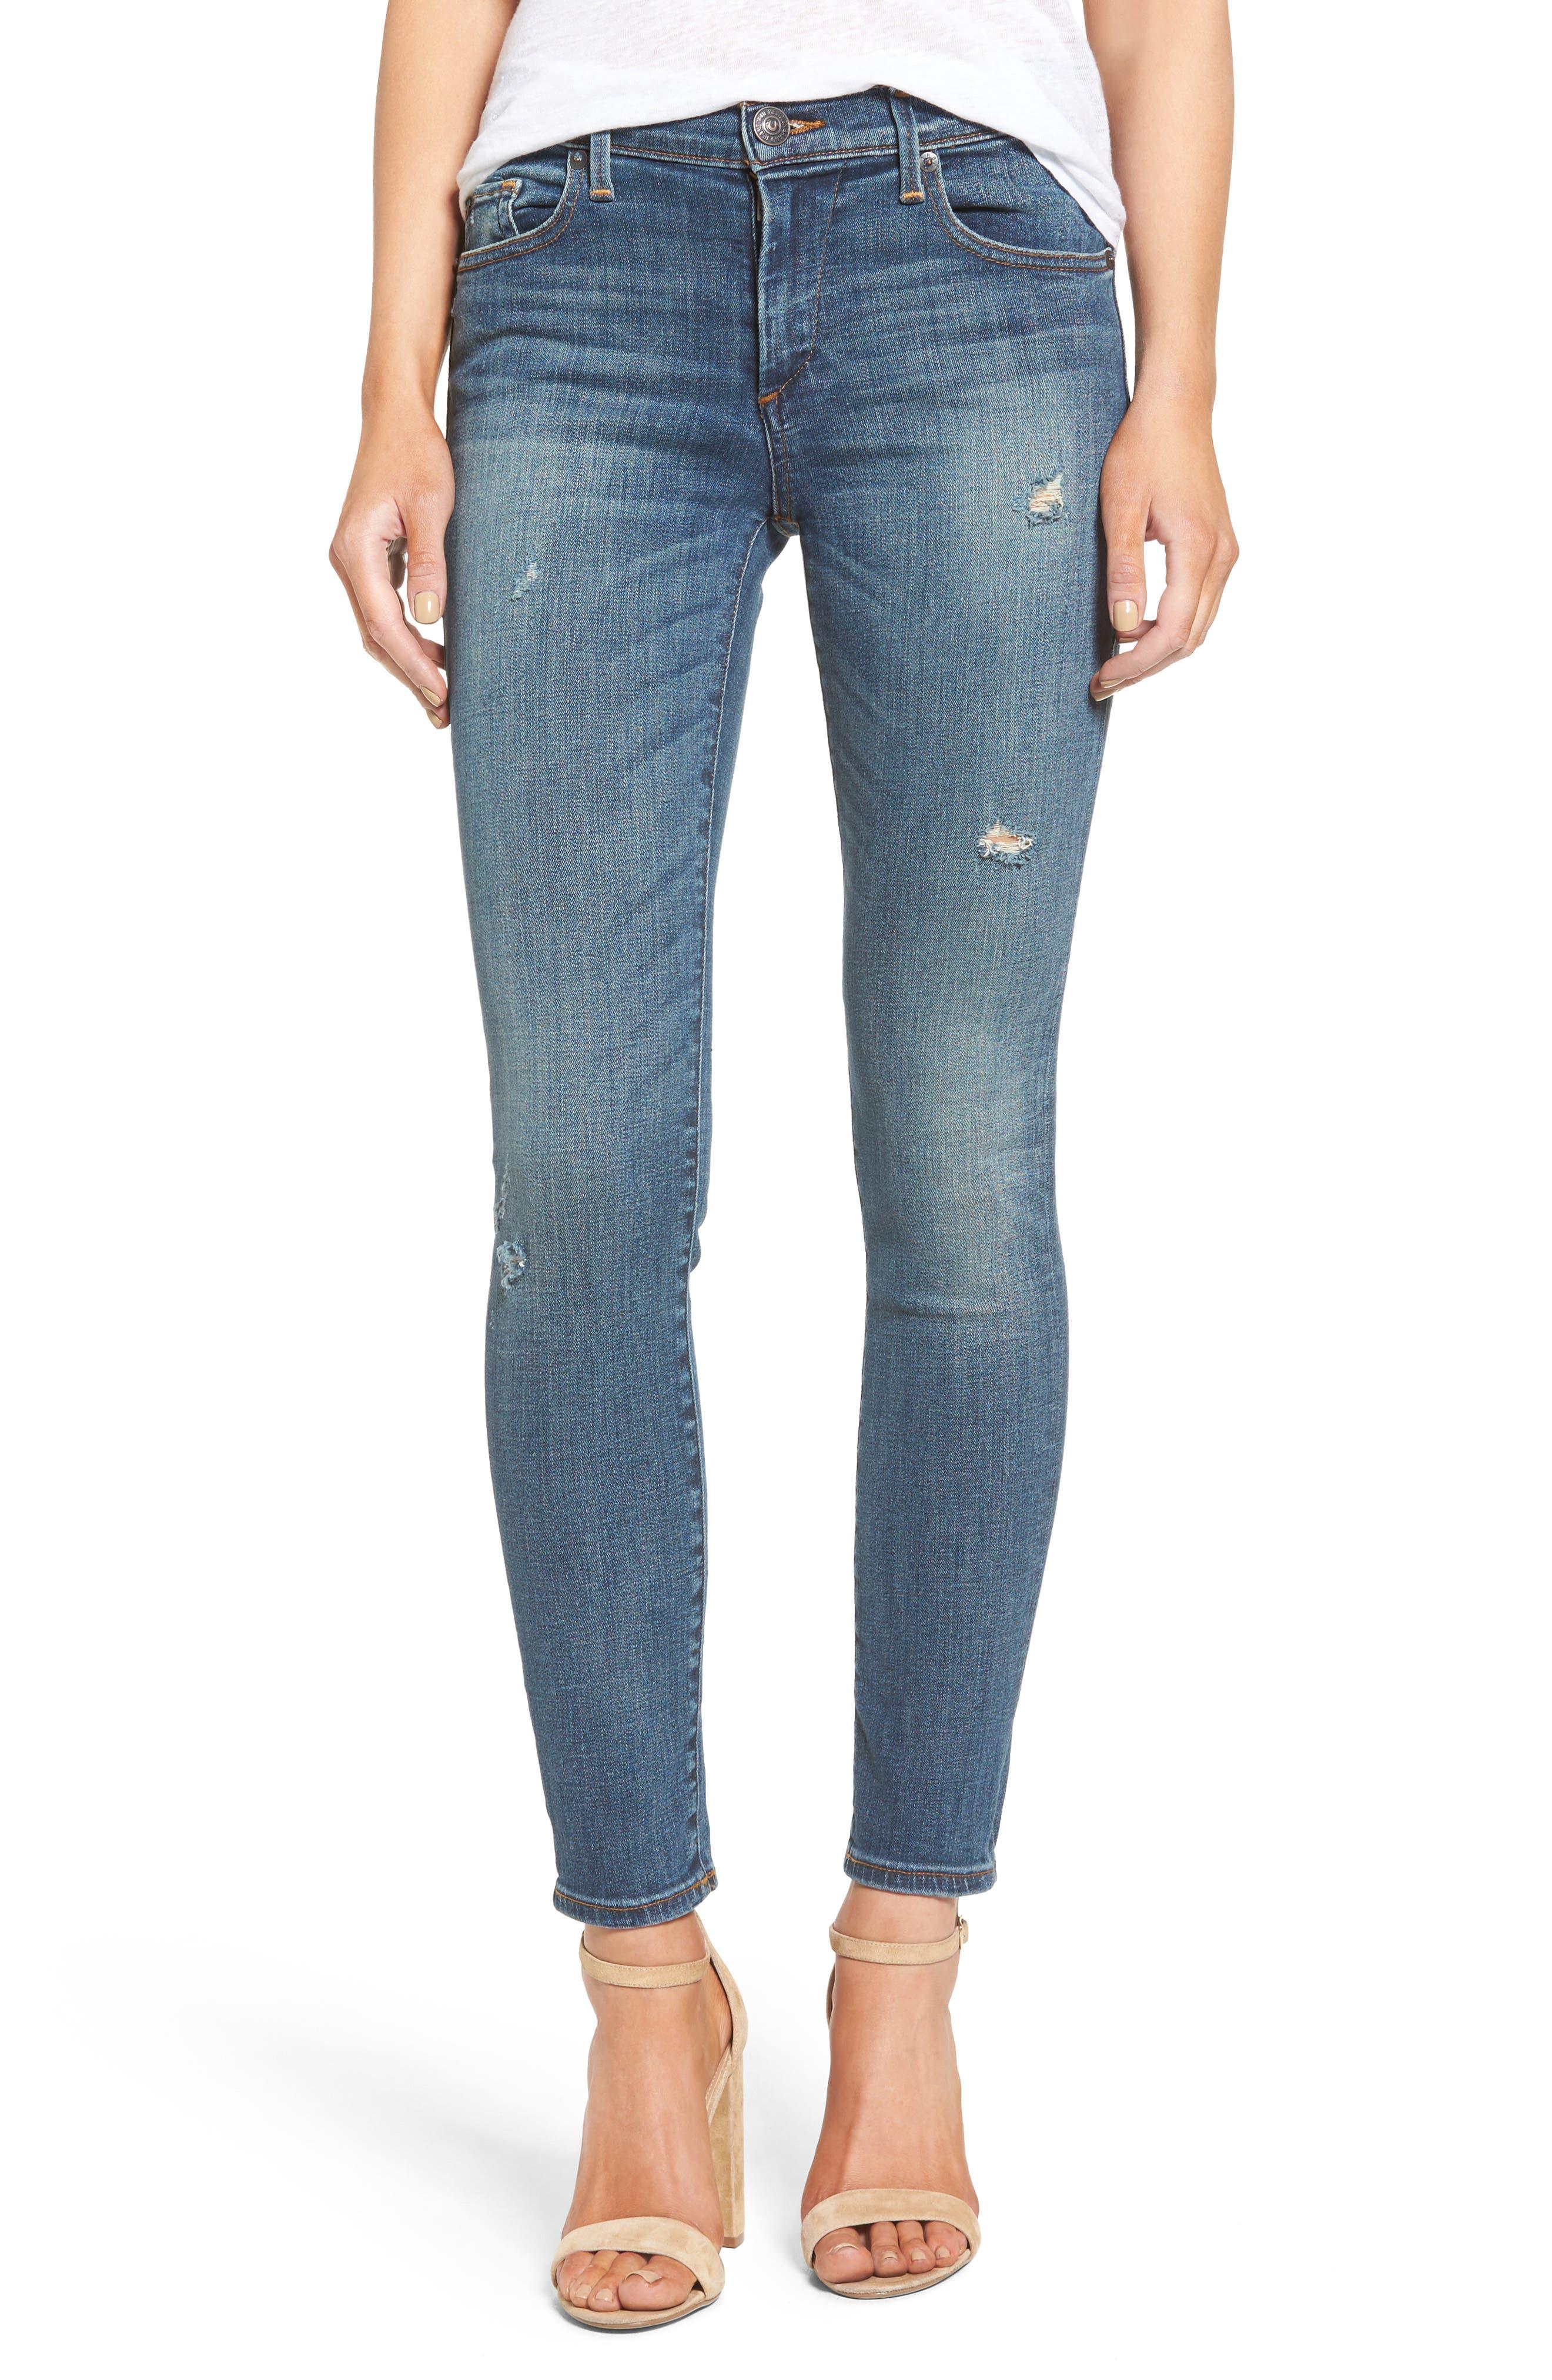 True Religion Brand Jeans Halle Mid Rise Super Skinny Jeans (True Haze)